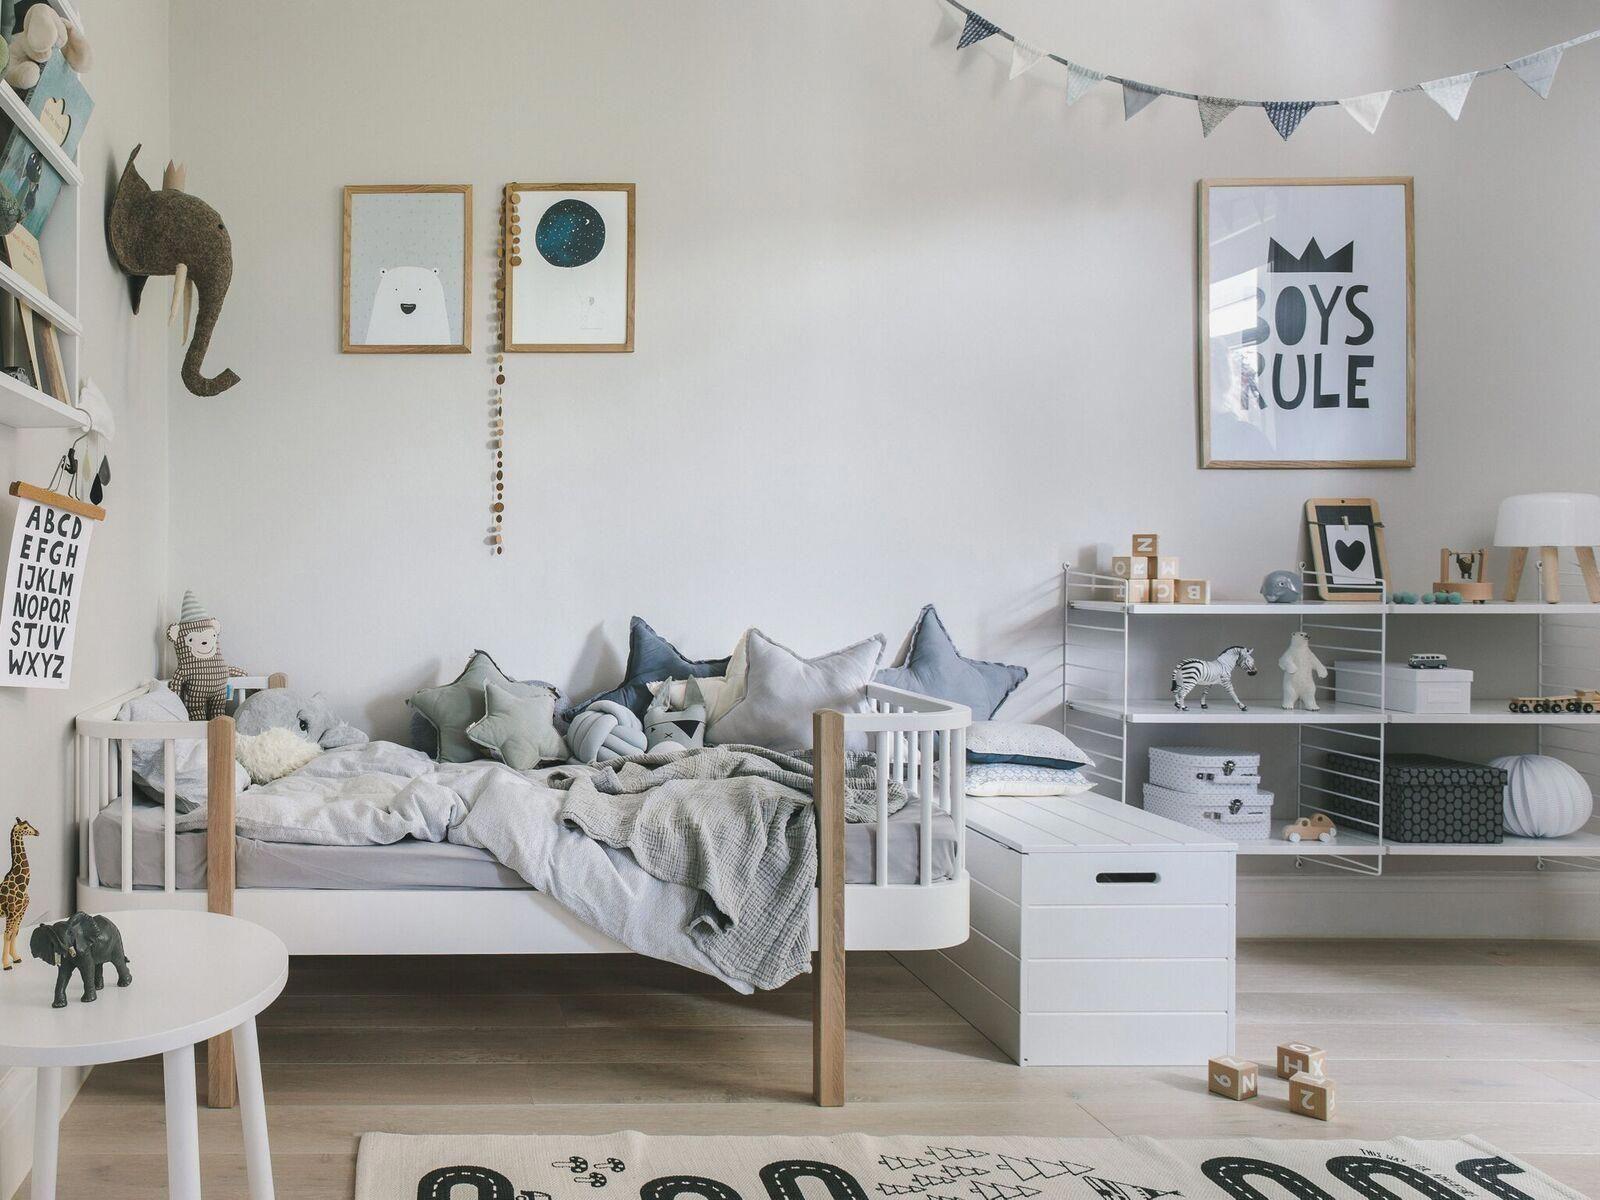 3 Bedroom Themes For Teenage Guys Kids room interior